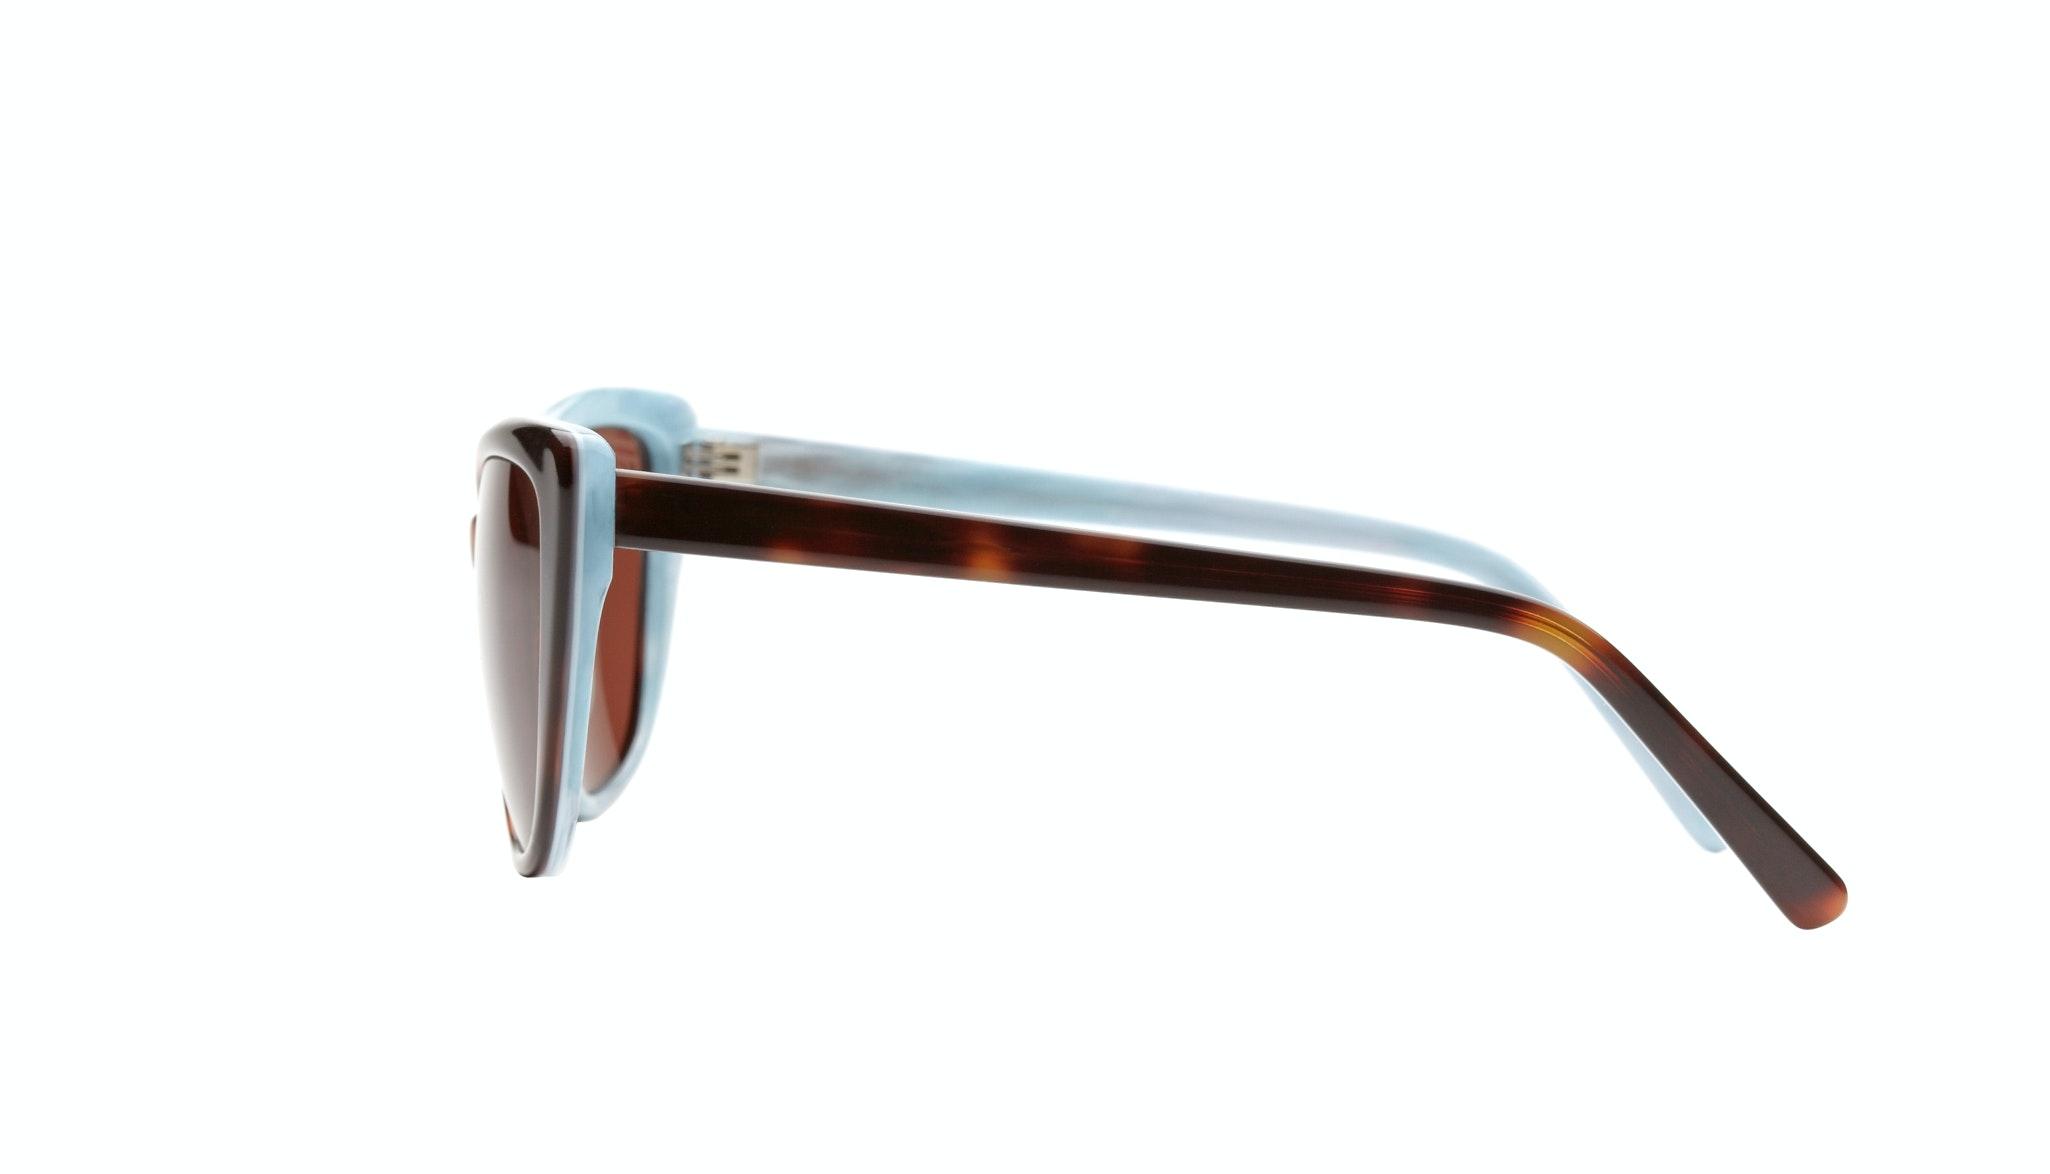 Affordable Fashion Glasses Cat Eye Sunglasses Women Dolled Up Dreamy Tortoise Side